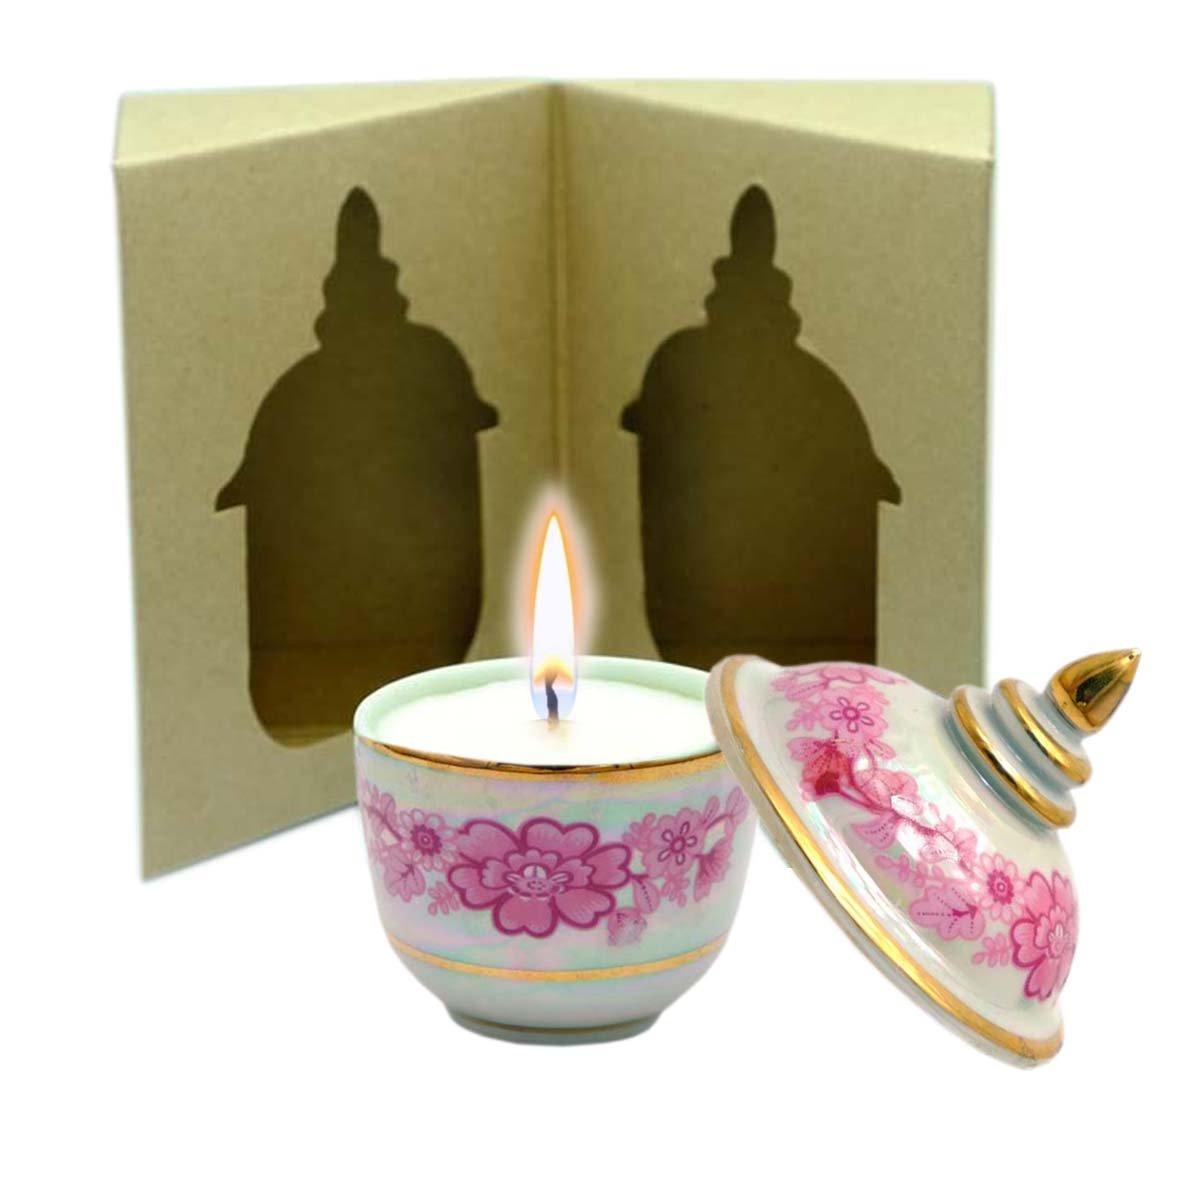 C'Lite Shea Butter Massage Candle 1.5 Oz In Thai Porcelain - Oriental Blend